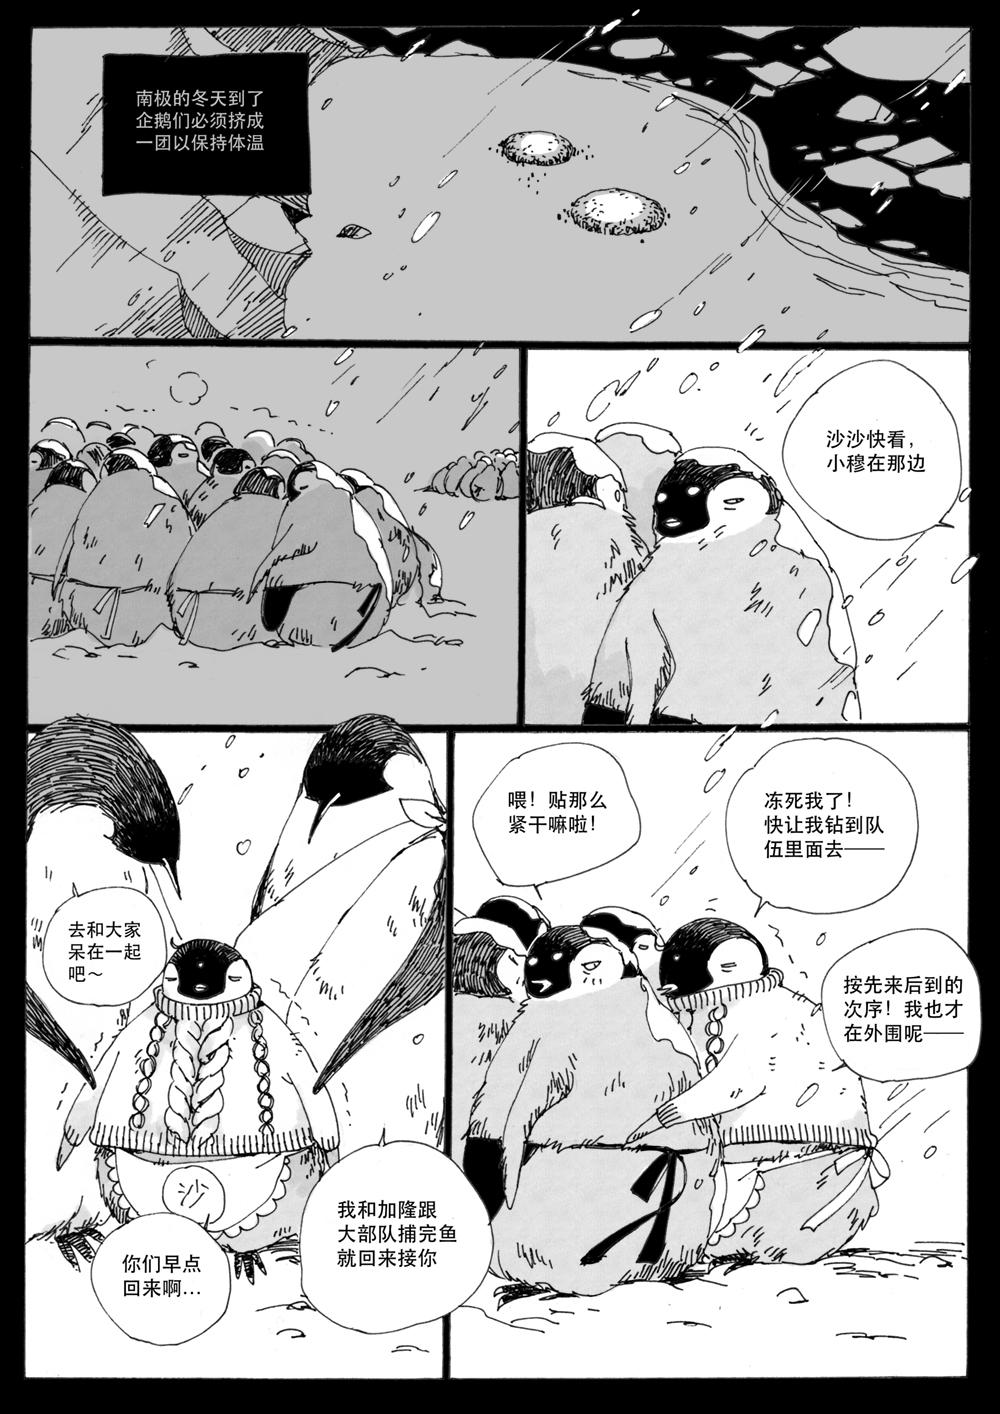 penguin30_1000